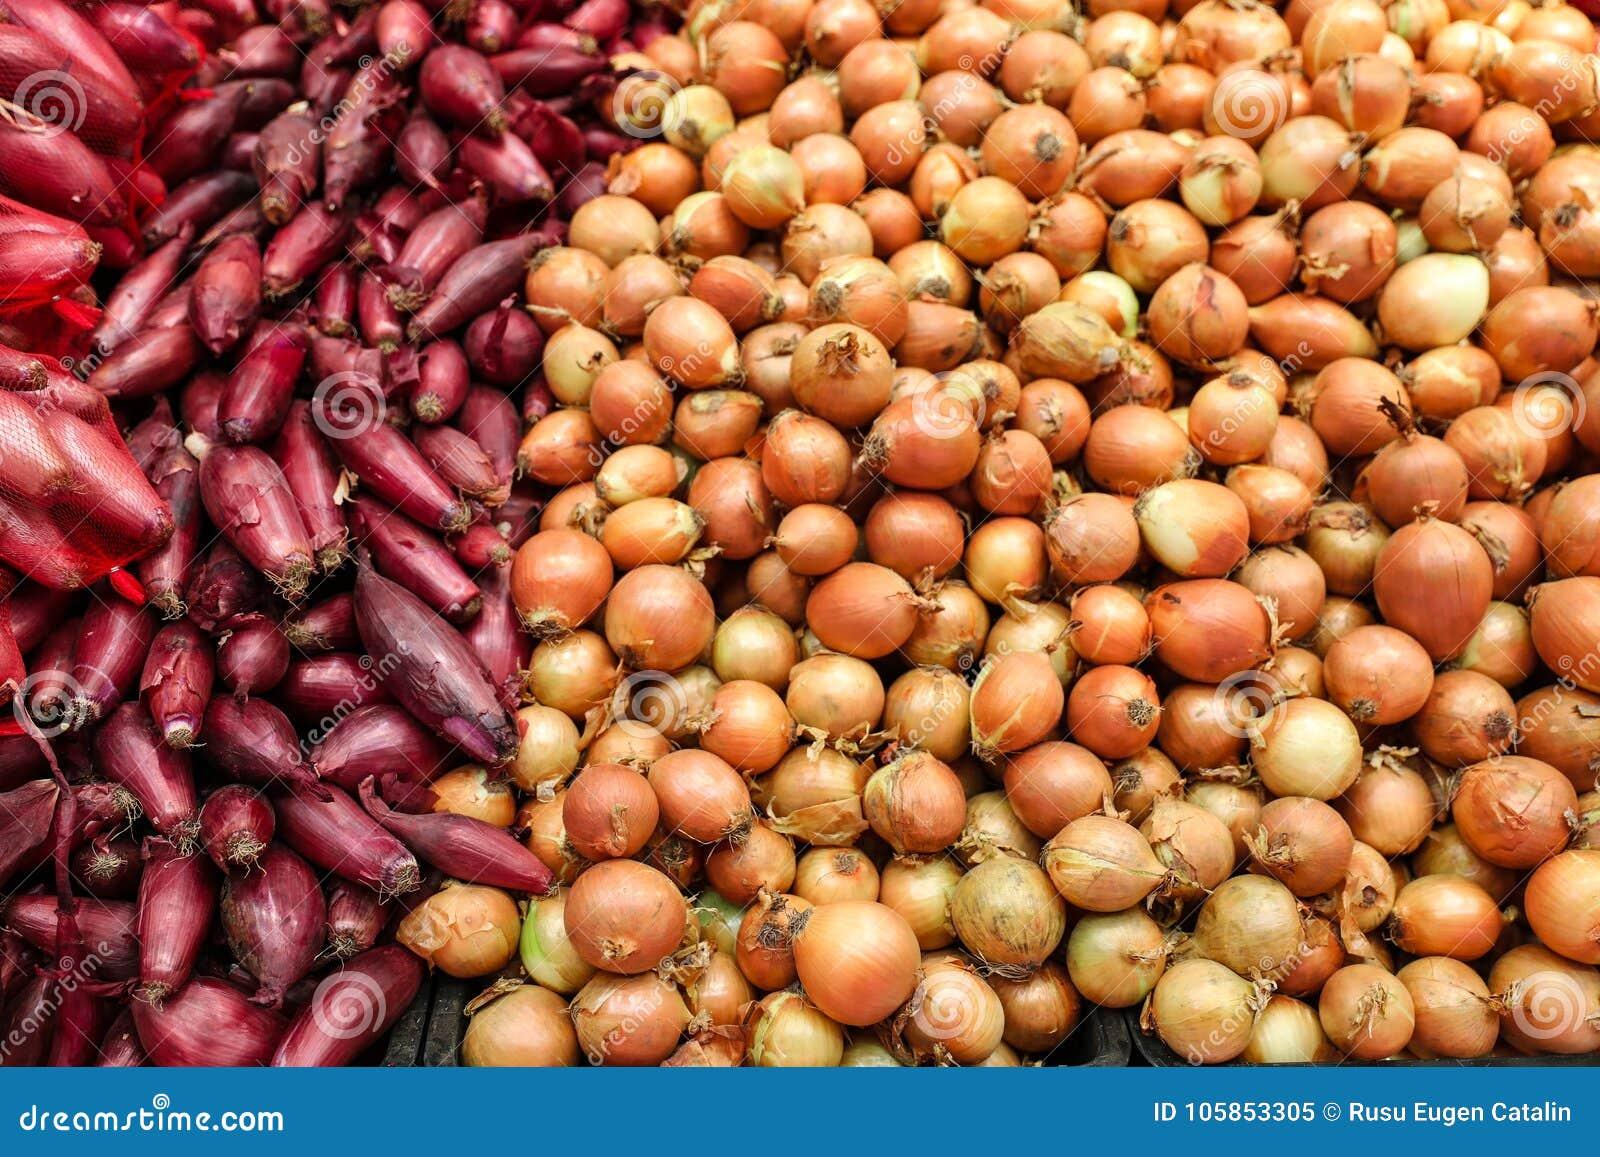 onions bulk